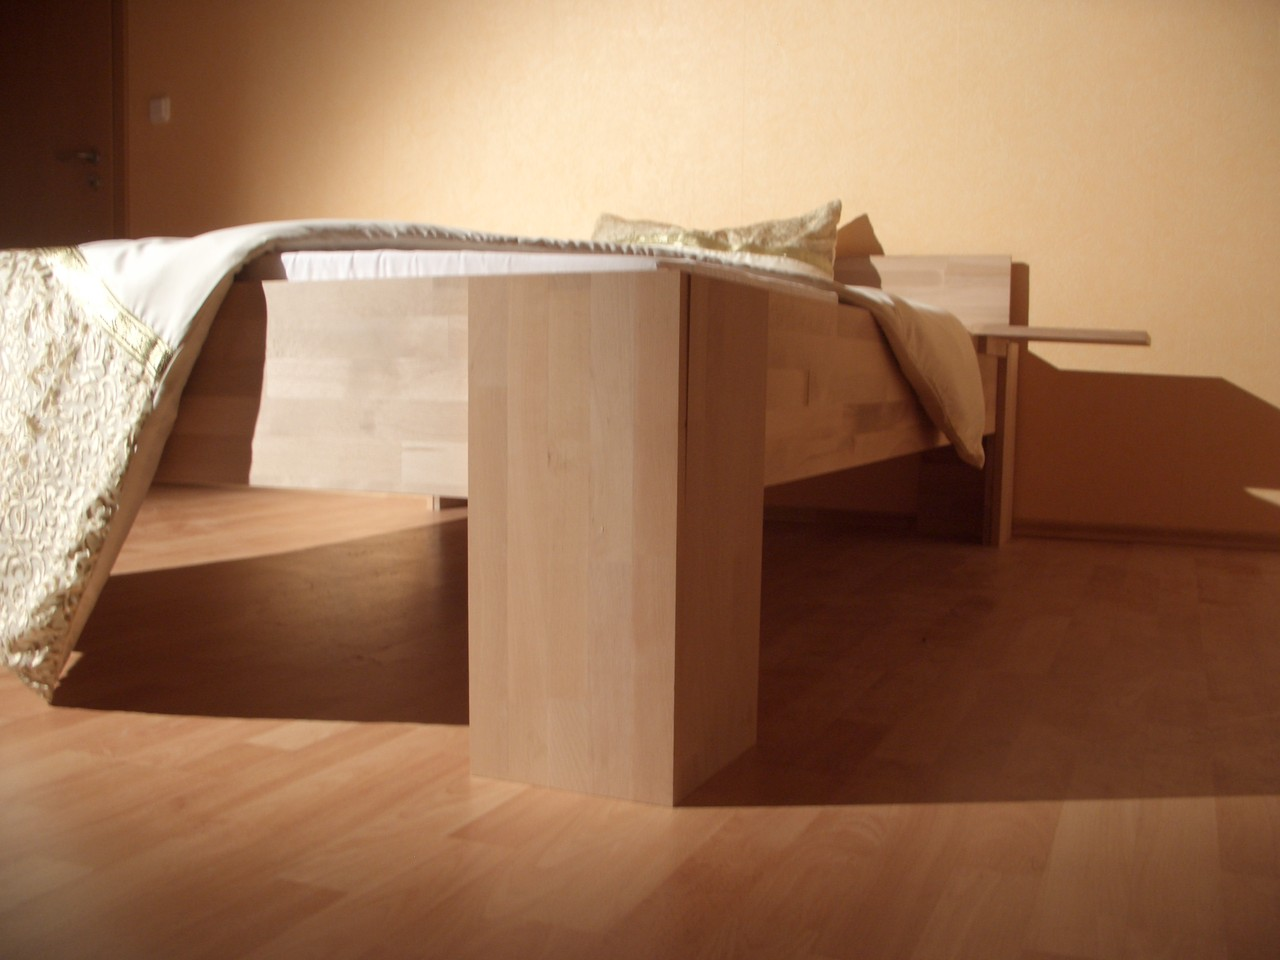 Betten aus buche spielt rme und klettert rme ba ner for Bett 200x220 holz